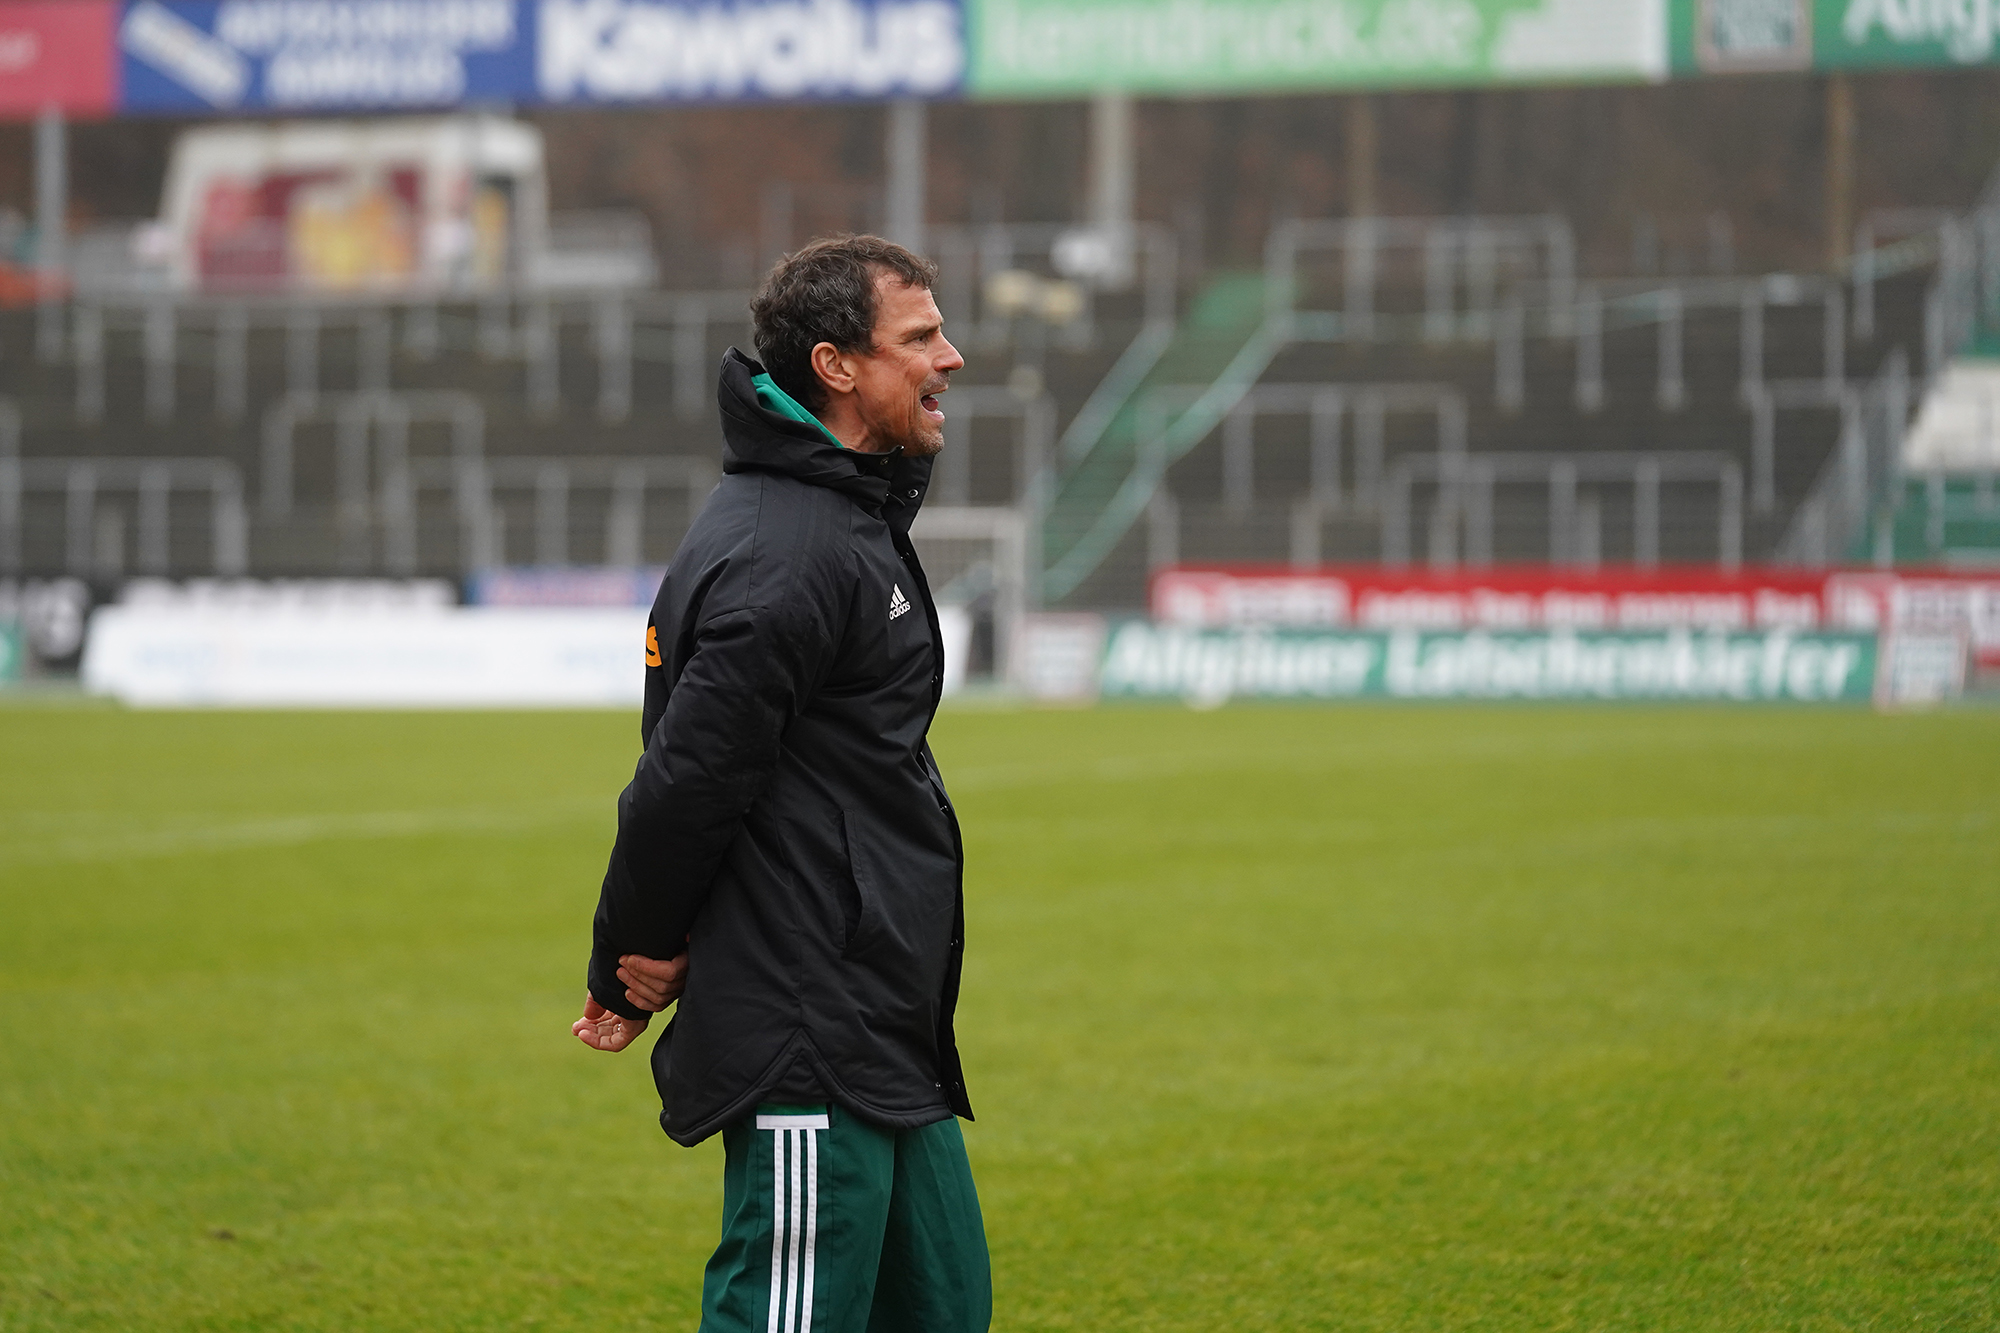 06.02.2021   Saison 2020/21   FC 08 Homburg   FC Gießen